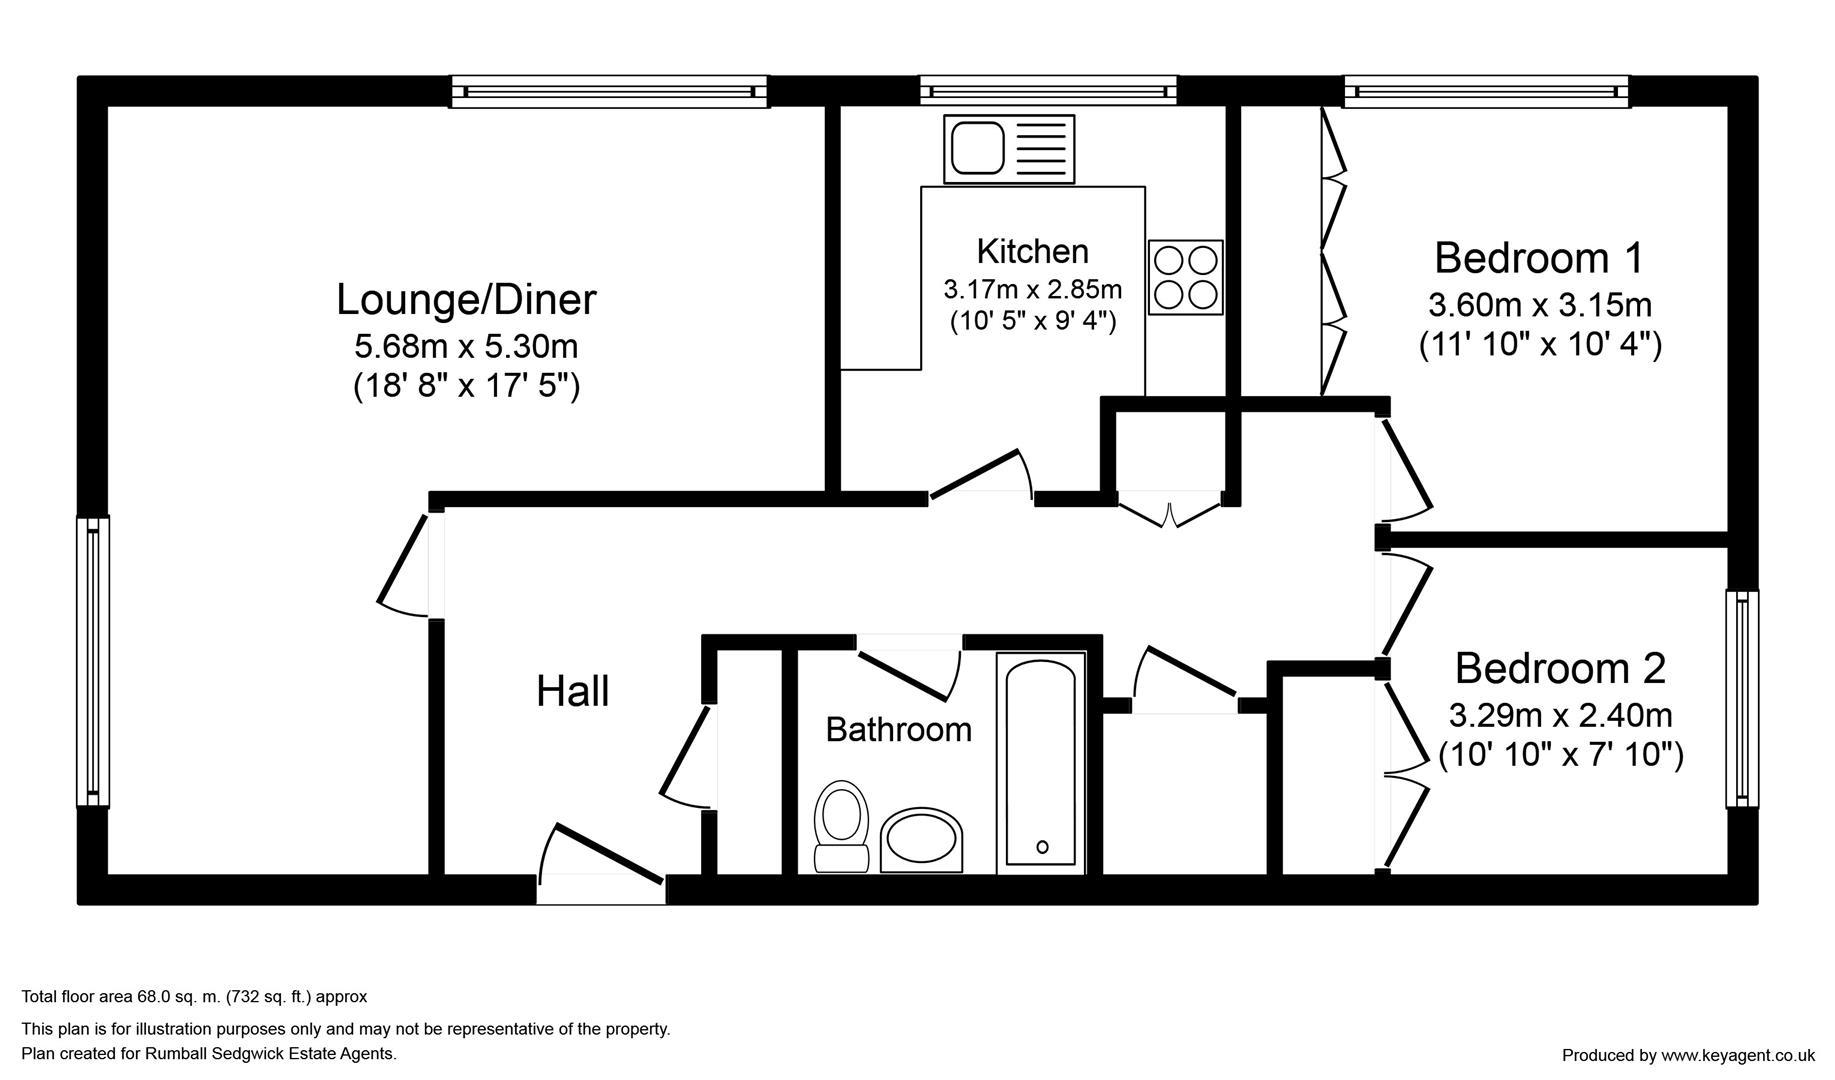 Floorplan: 1000065002.final floorplan.jpg